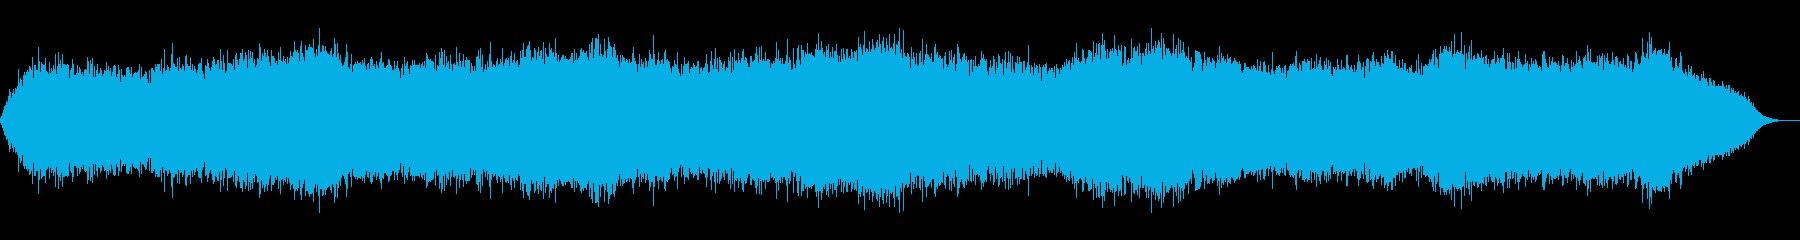 drone15の再生済みの波形